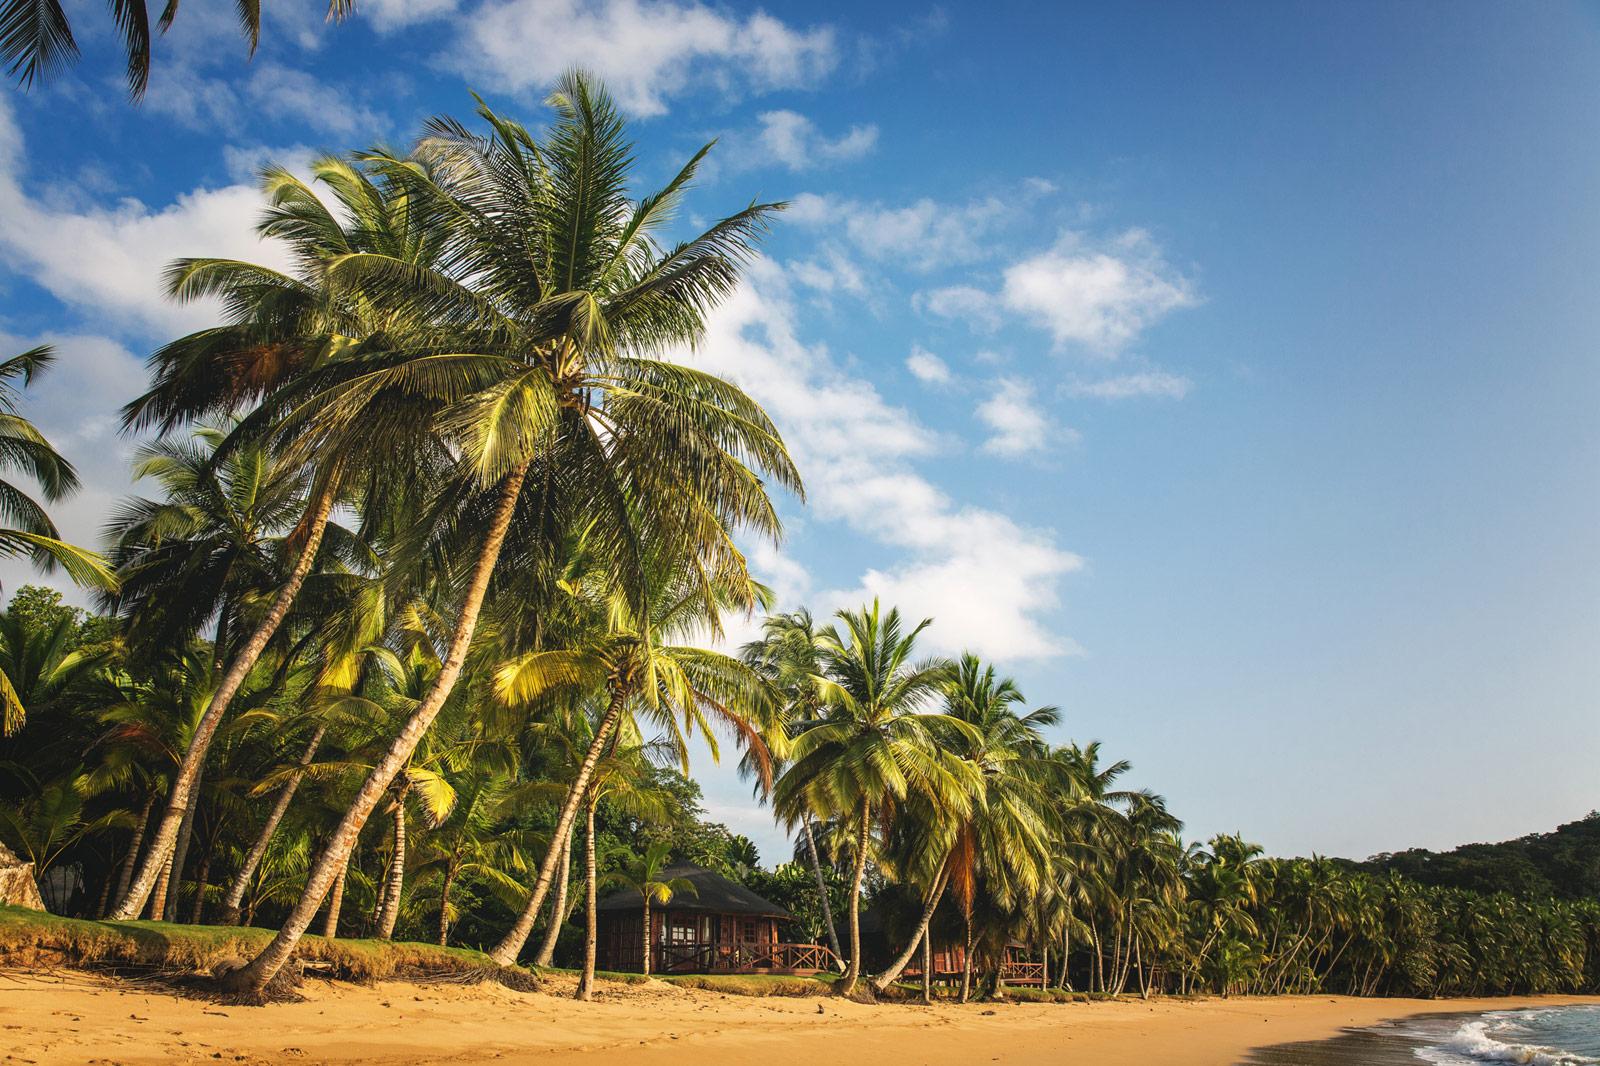 palm-beaches-principe-Artur-Cabral-CZ3B4407-Editar